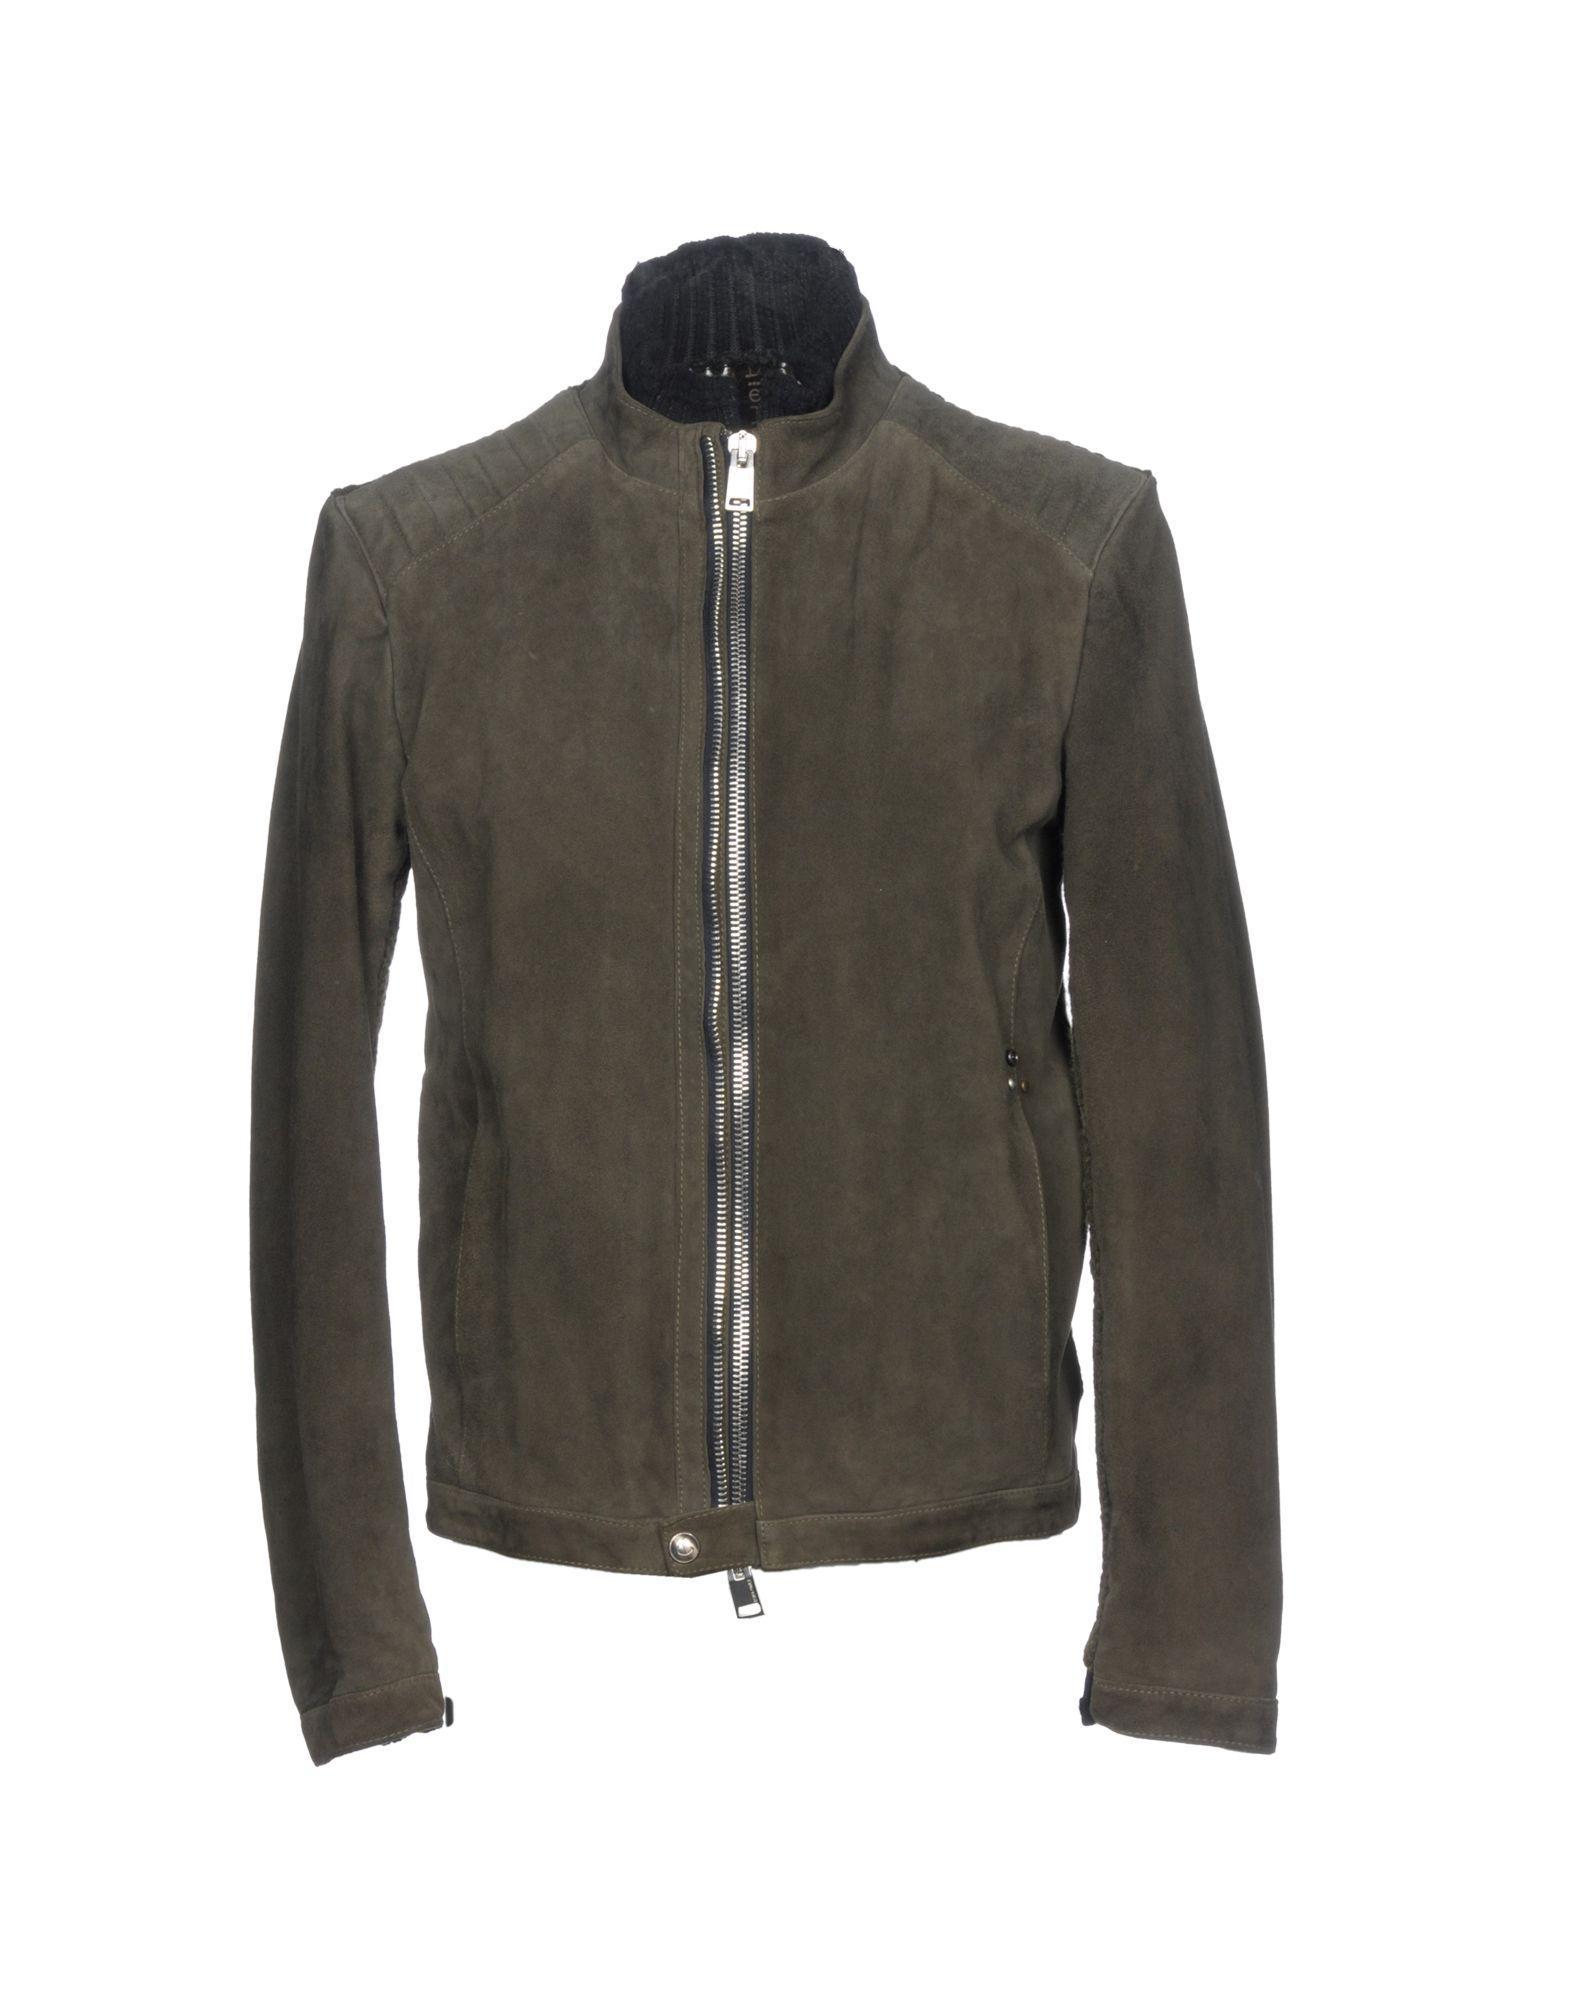 Delan Biker Jacket In Military Green